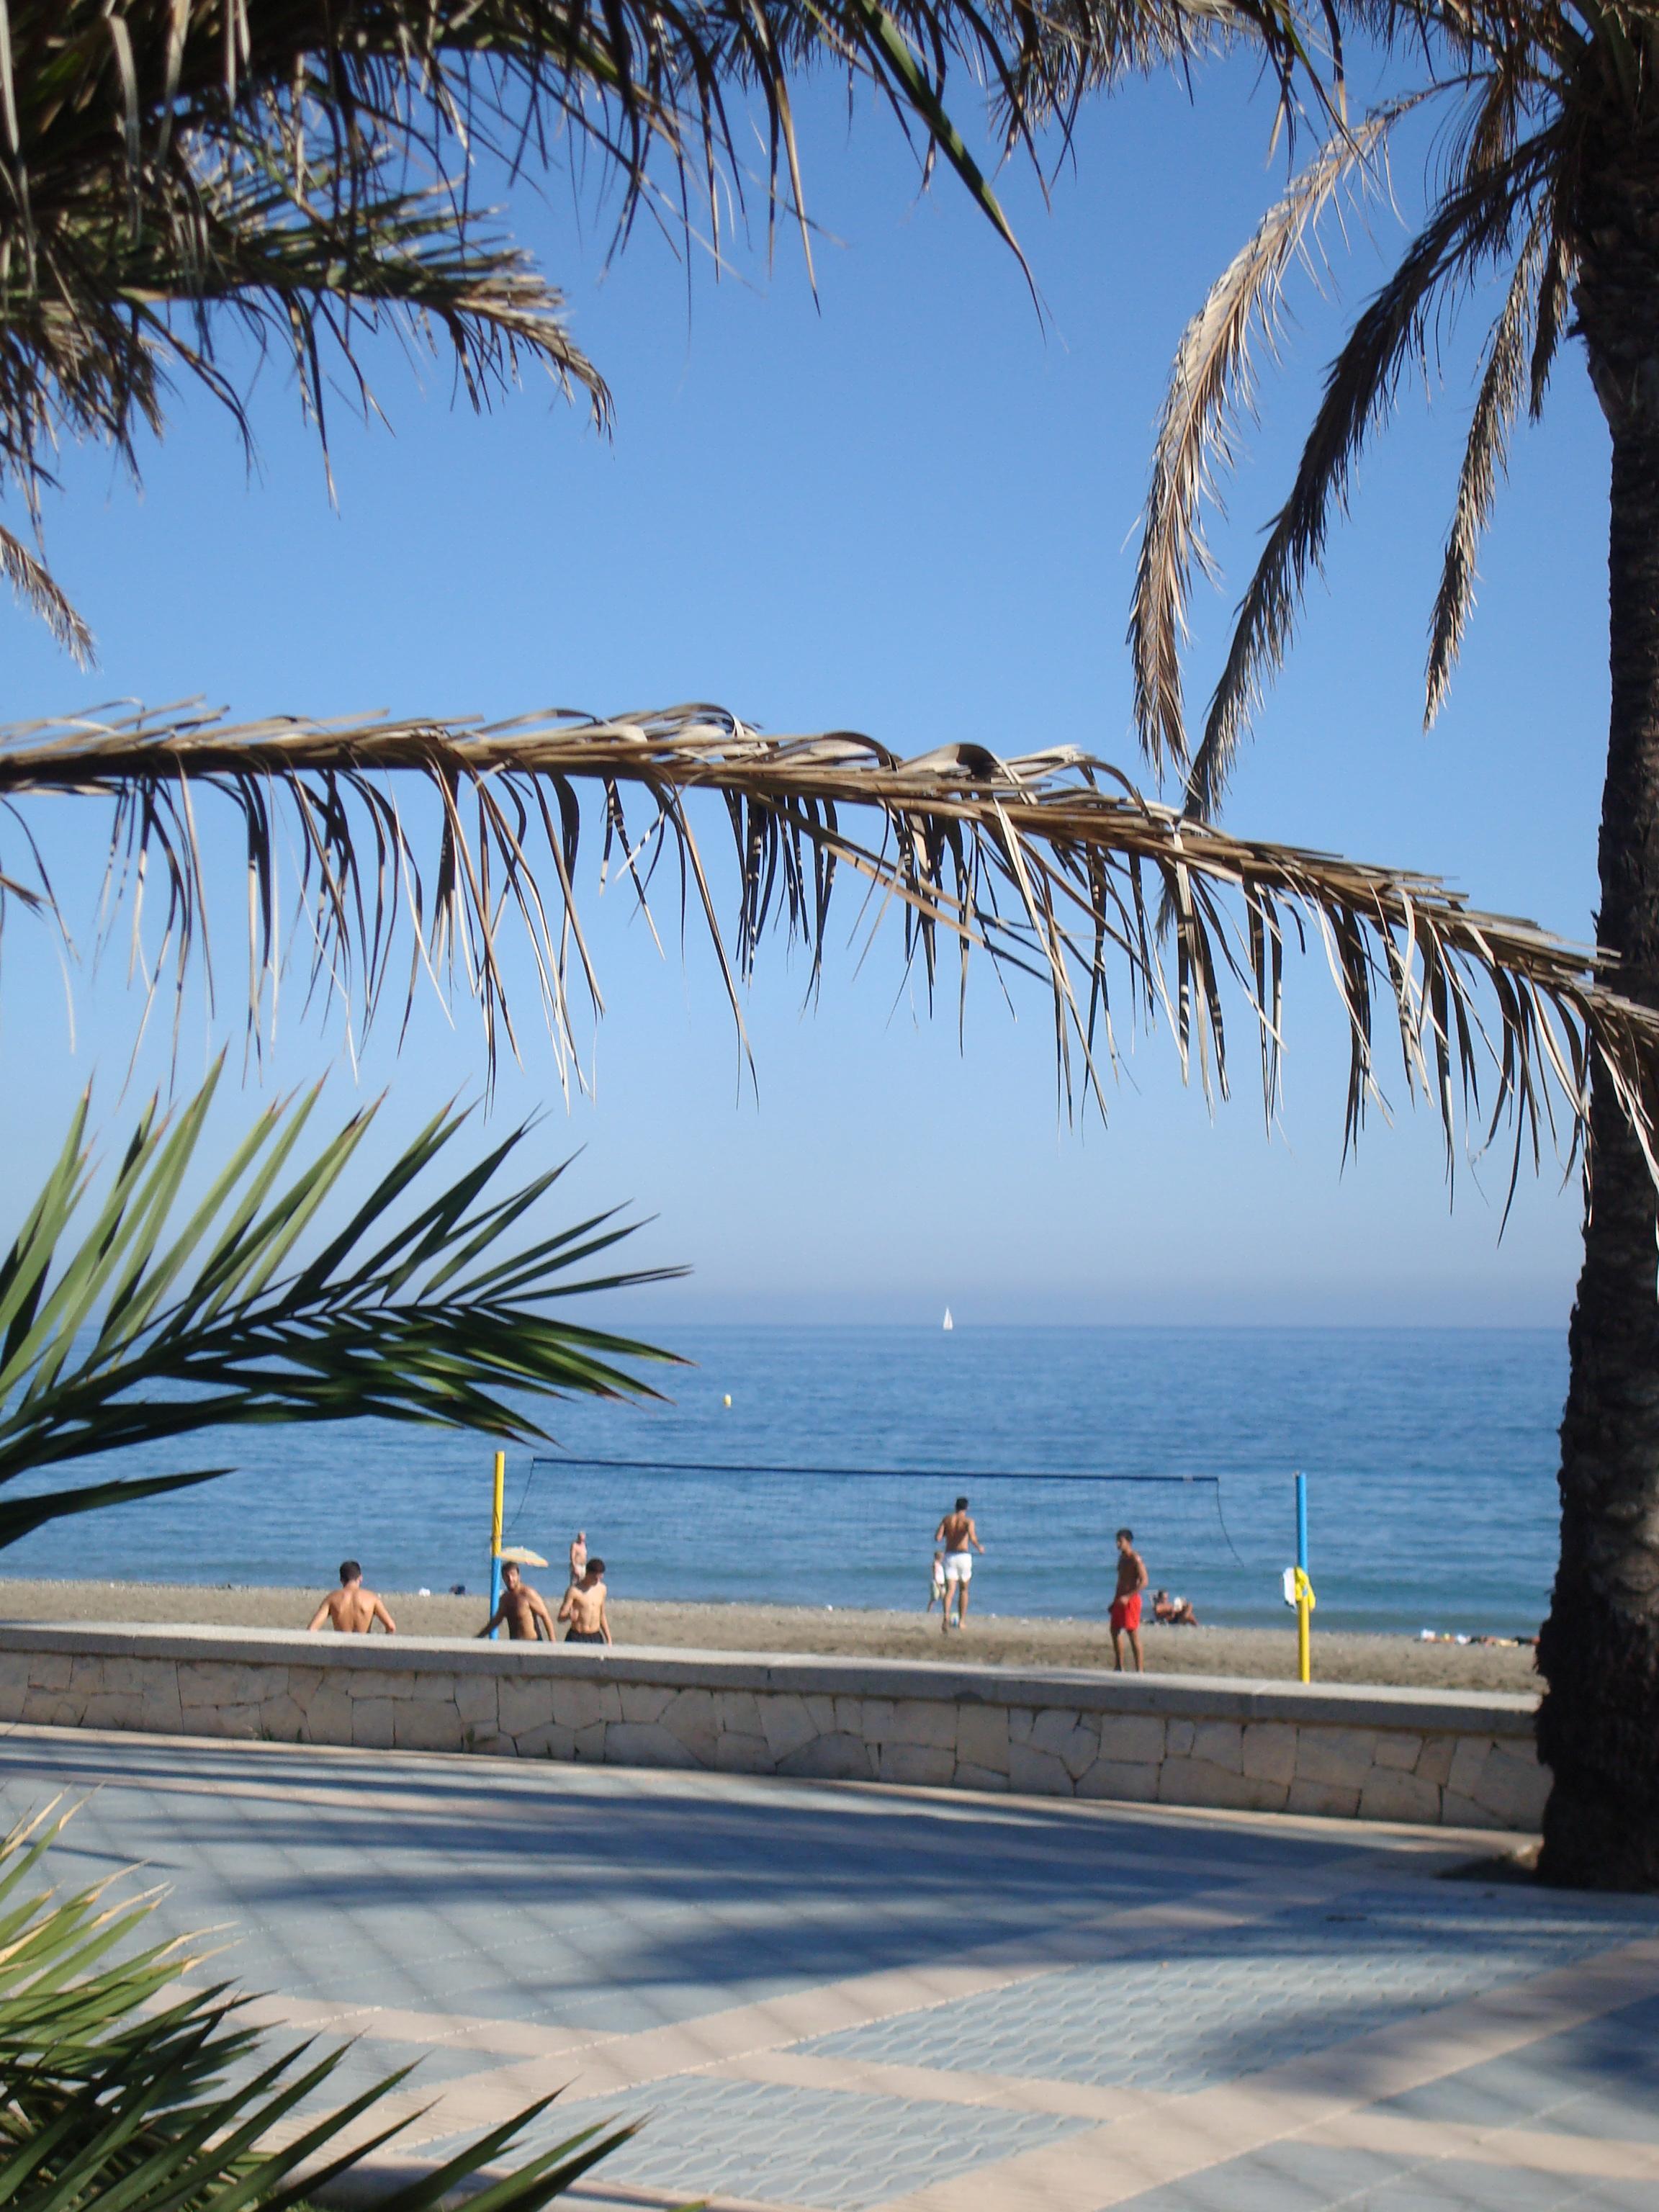 San pedro beach, malaga province andrew forbes (2)